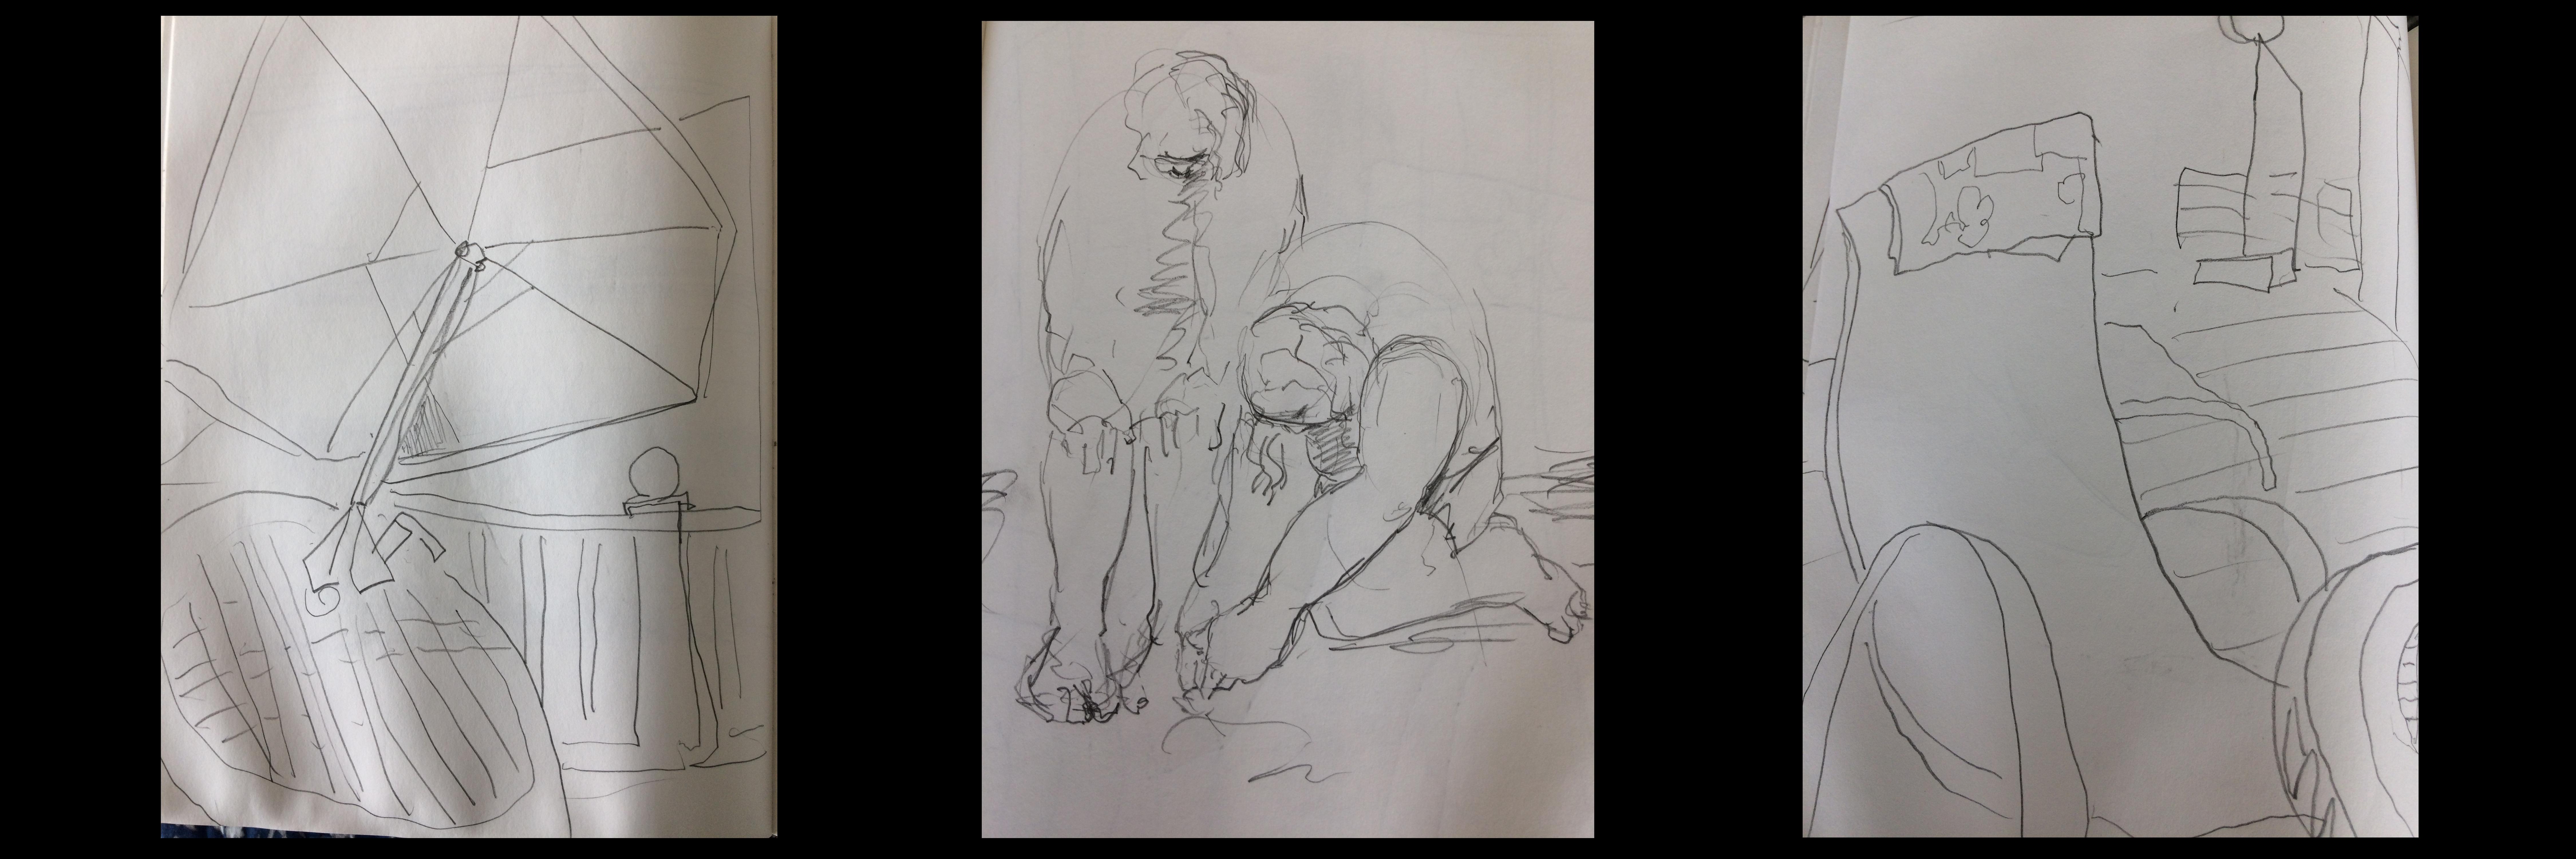 HH sketches